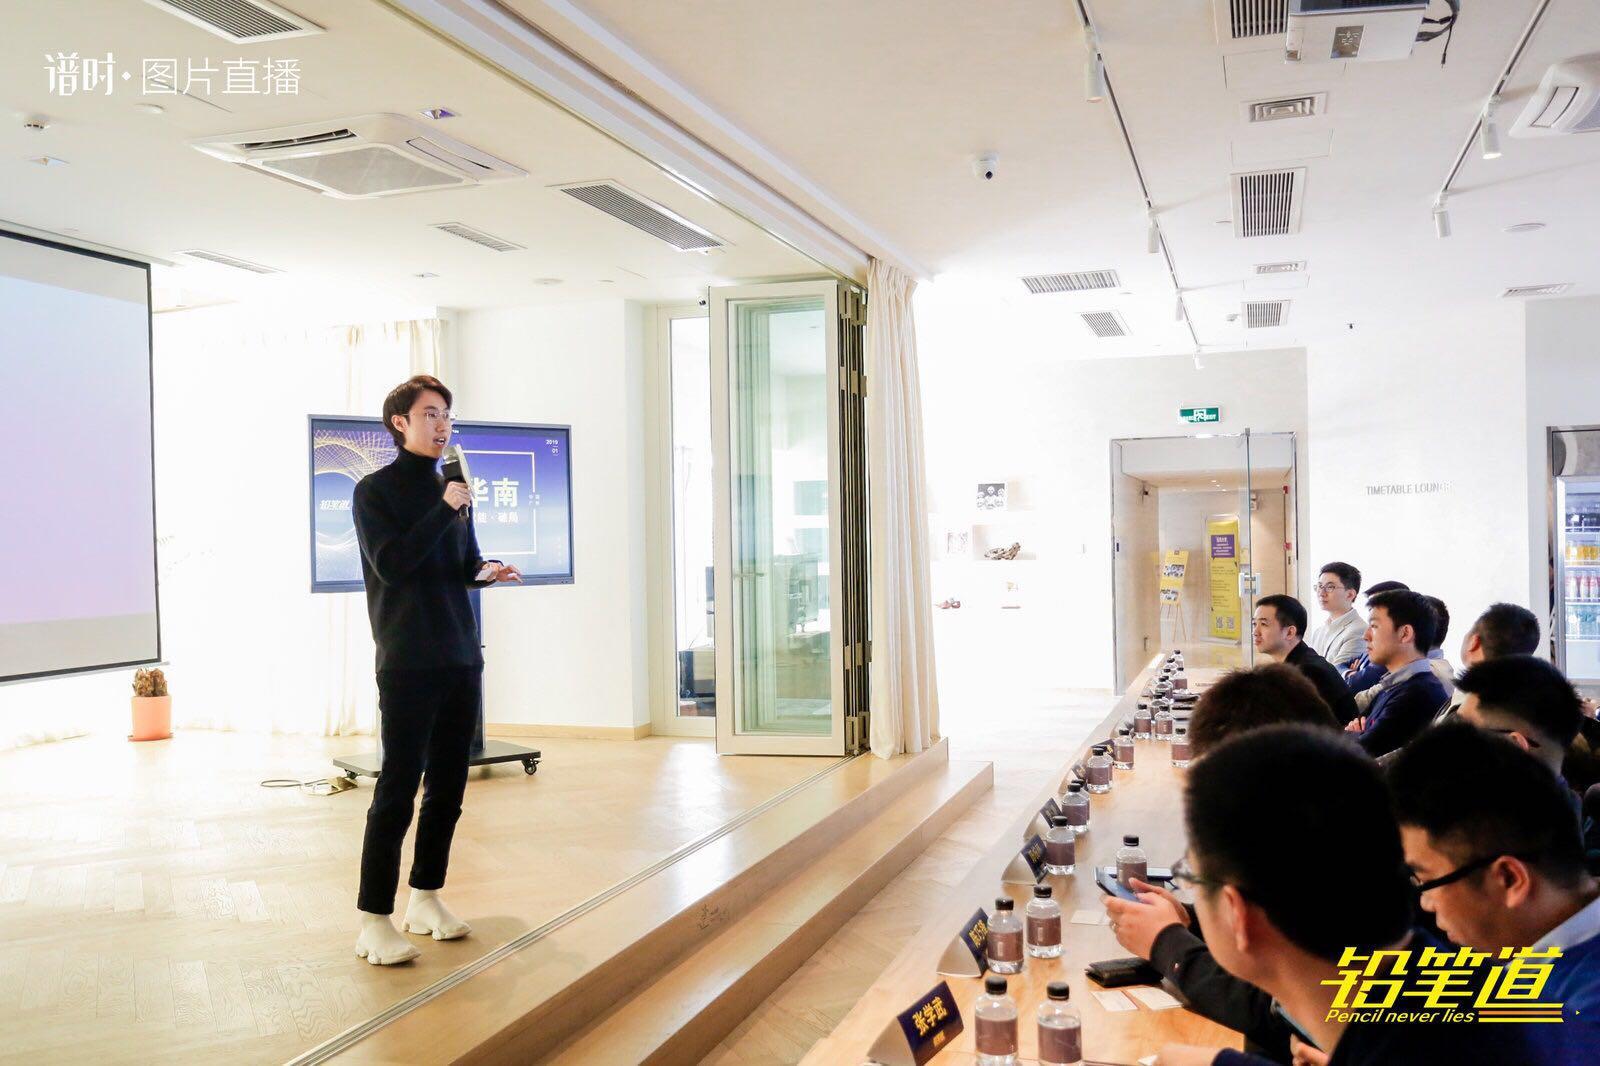 TIMETABLE联合办公空间创始人吴嘉惠分享了他对于新商业的思考。